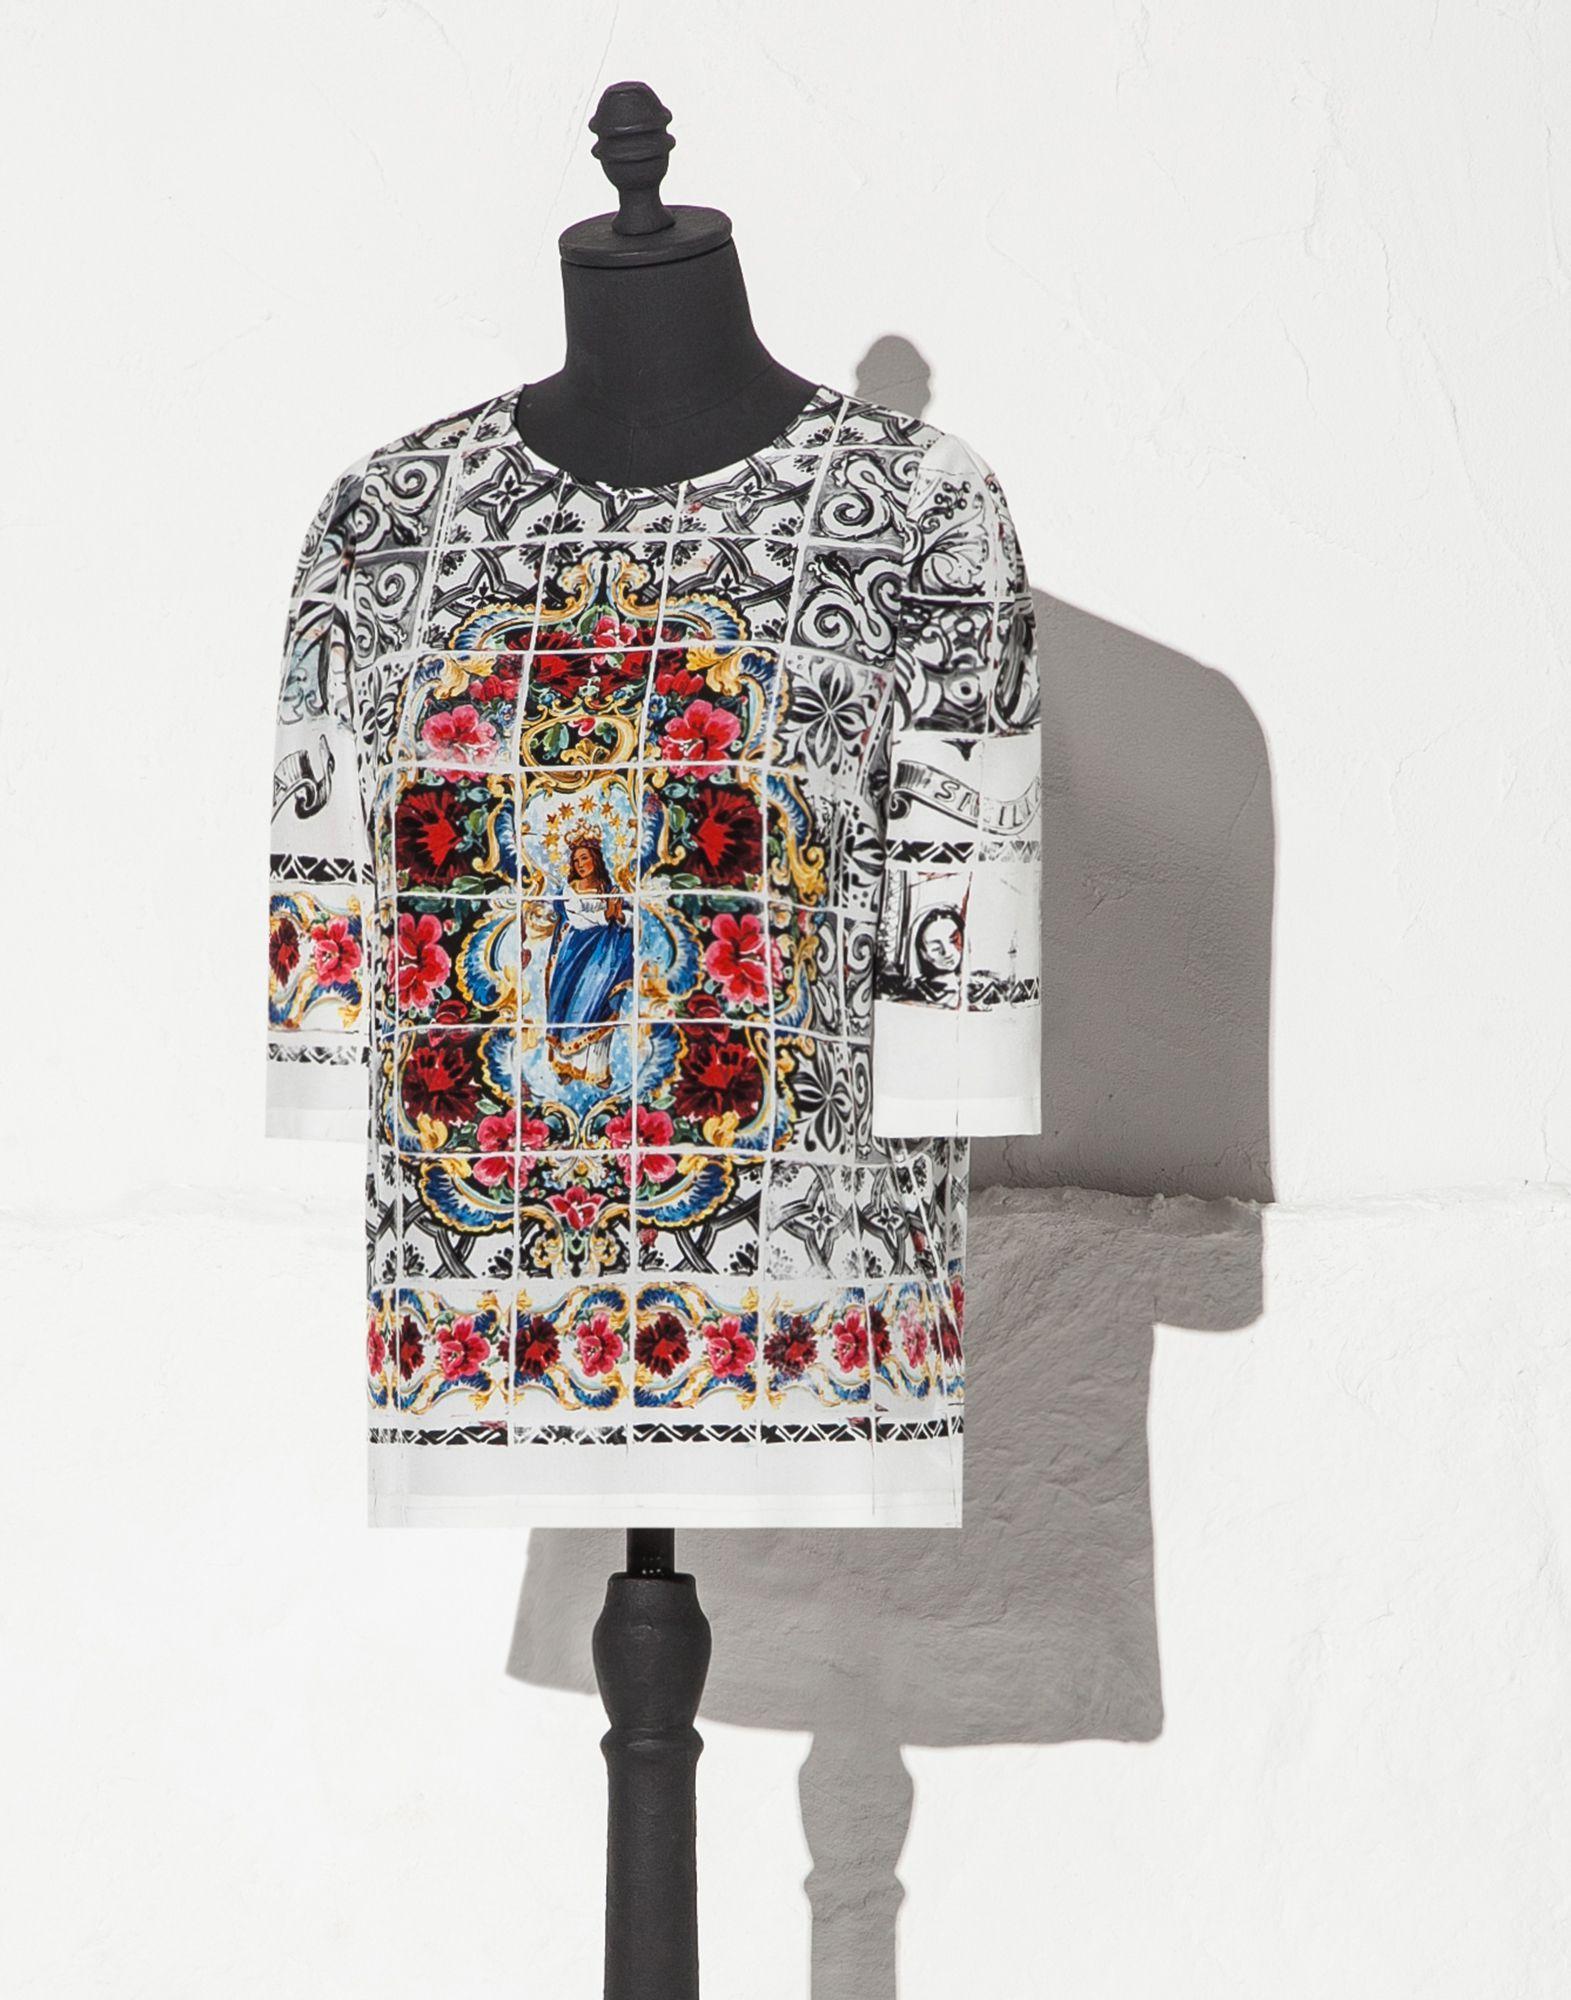 Carnation frame and majolica print silk crepe top | dolce&gabbana online store